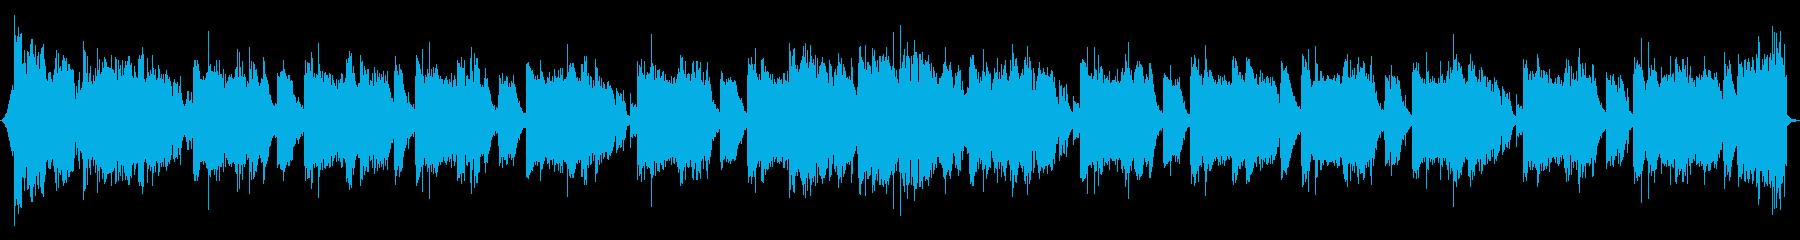 eSportsサイバーロックバンド30秒の再生済みの波形